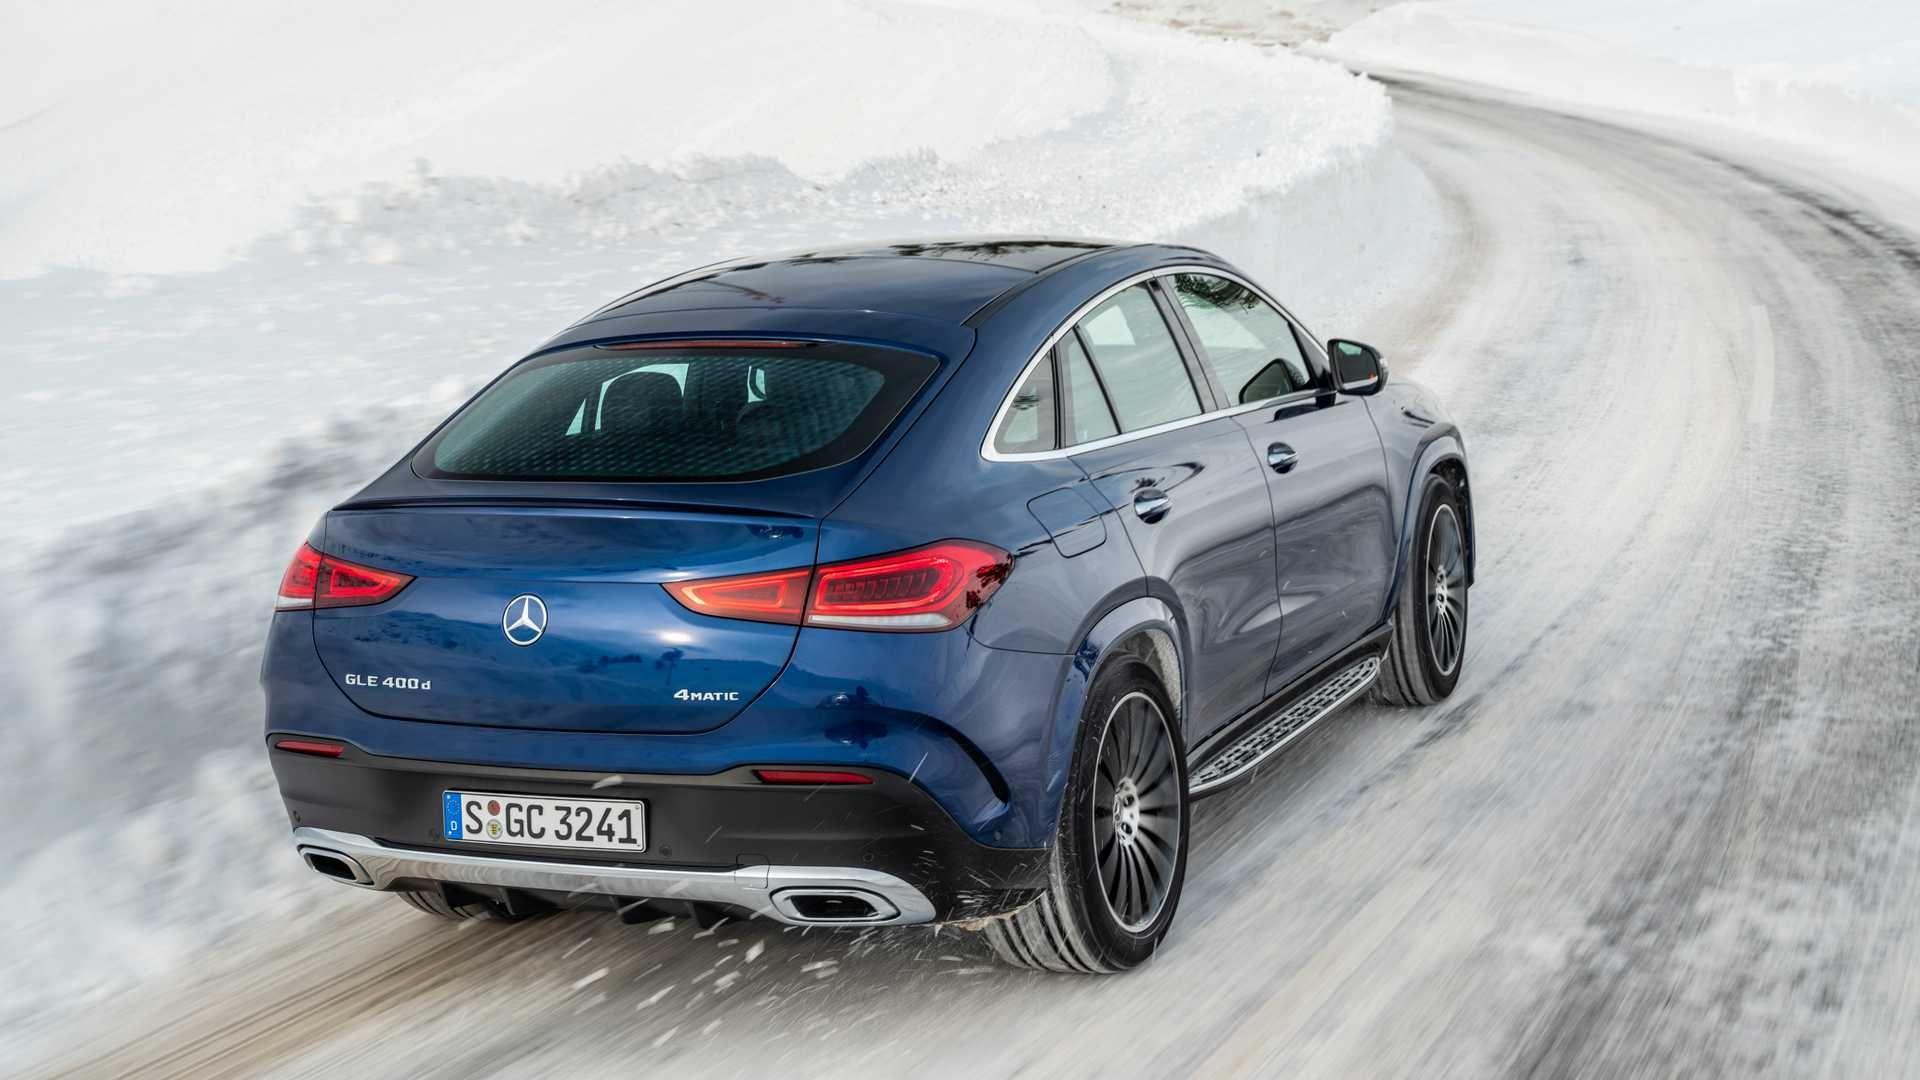 Mercedes-Benz GLE Coupe споживатиме лише 1 літр пального на 100 кілометрів